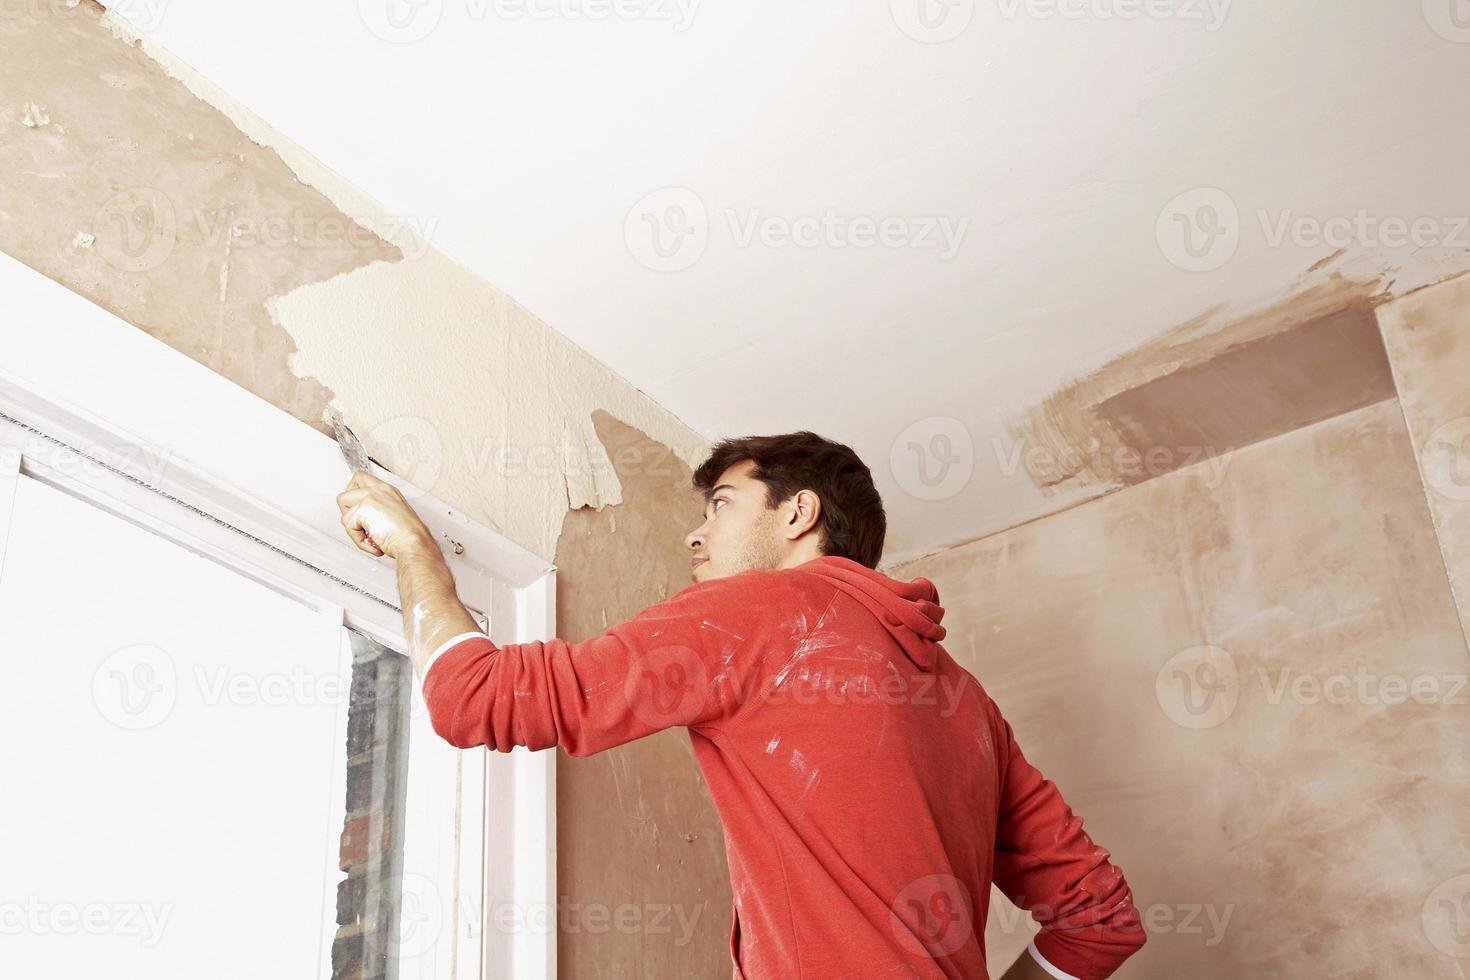 homme, racler, peinture, loin, mur, non, rénové, salle photo